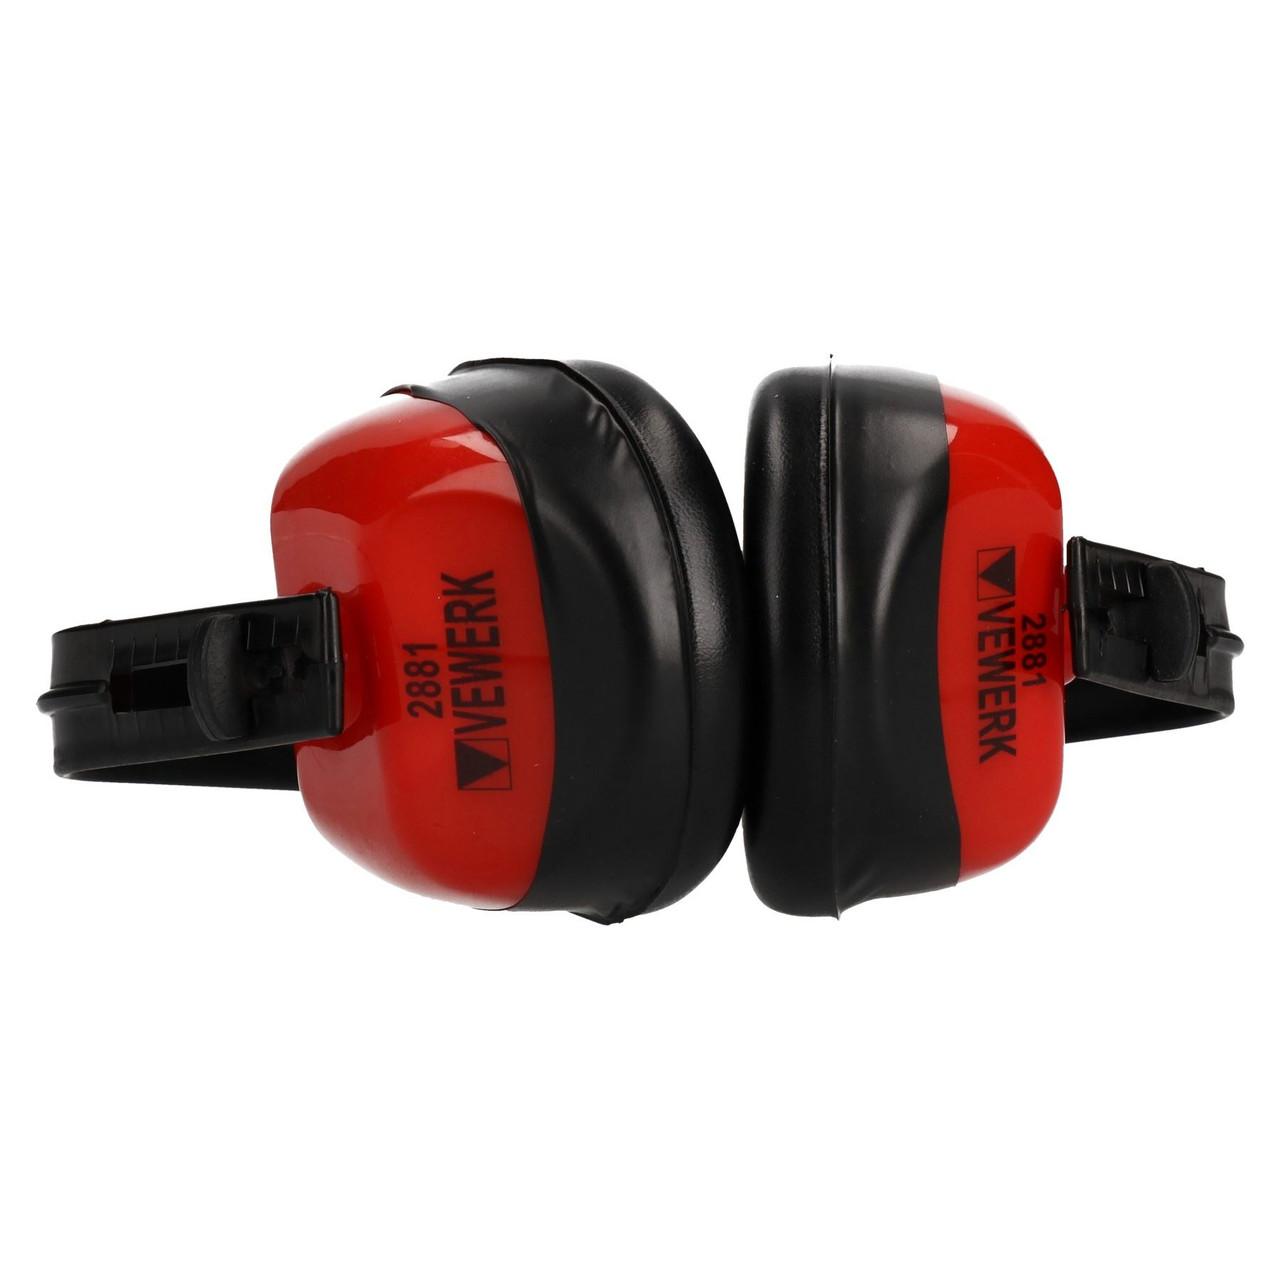 Plugs Safety Ear Protectors Noise Defenders Adjustable AU049 Muffs